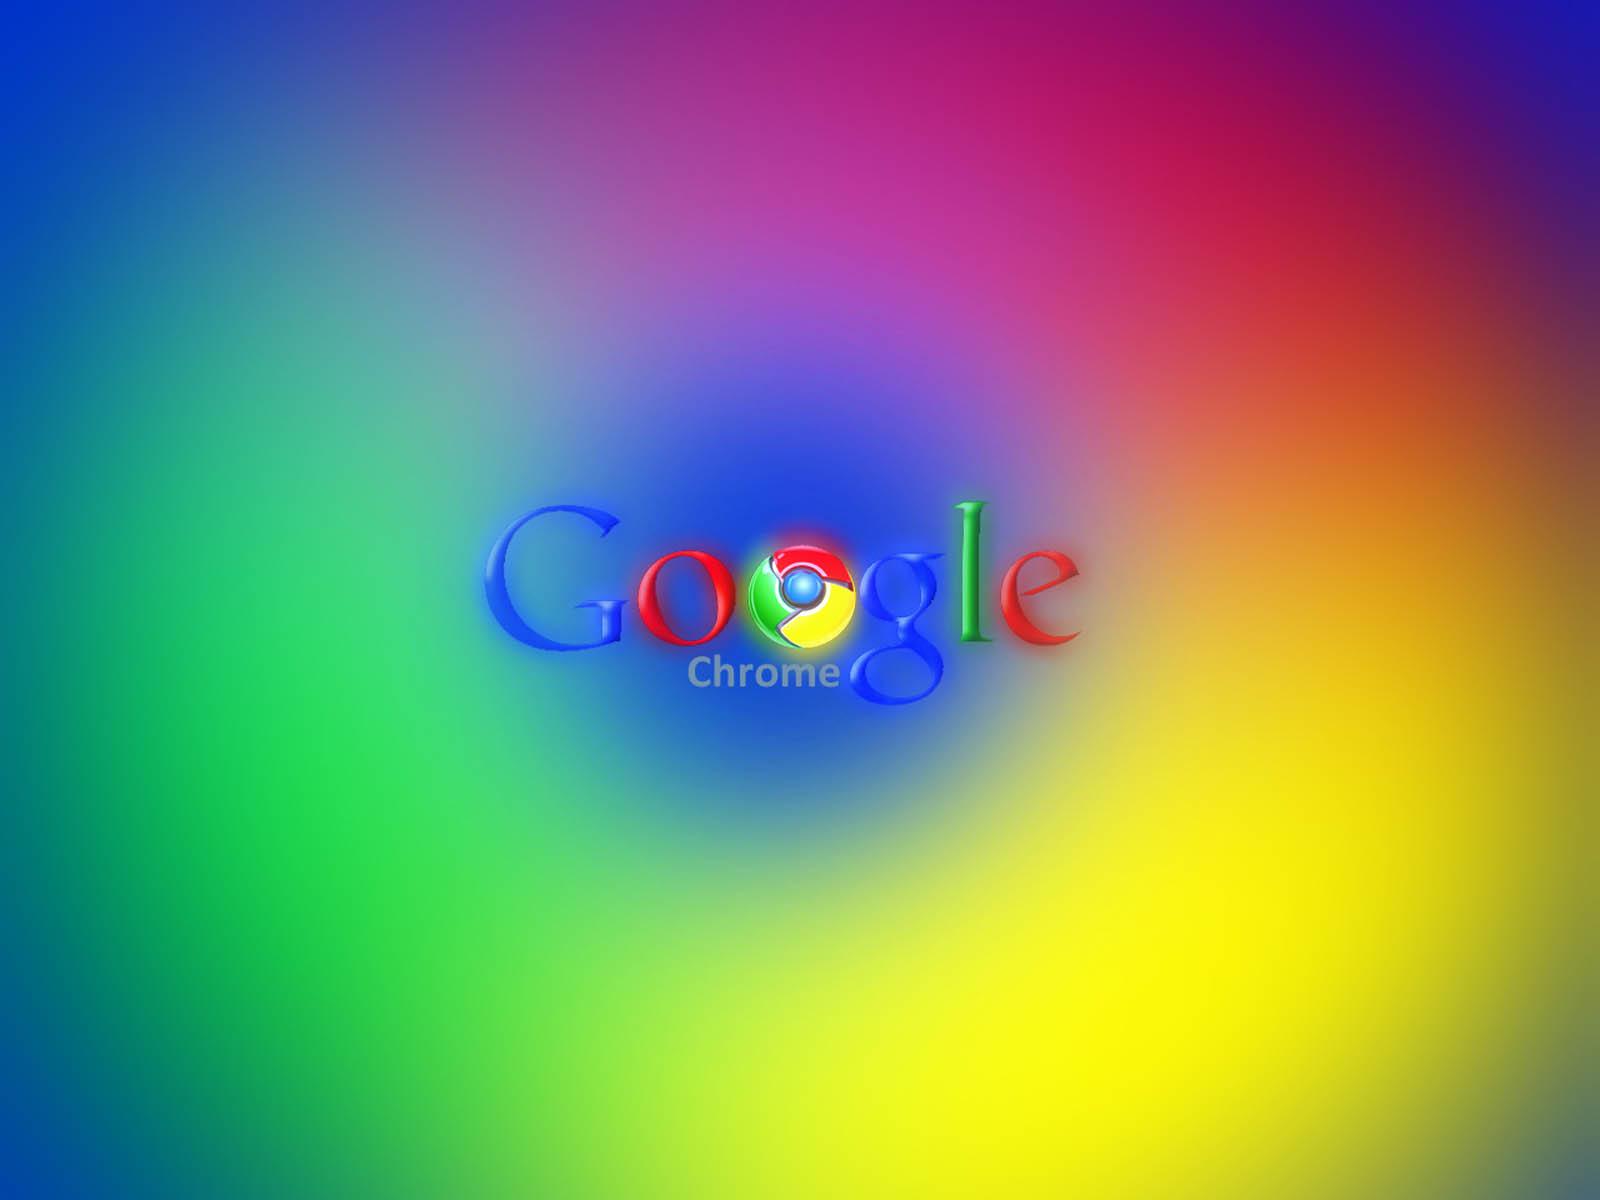 http://2.bp.blogspot.com/-cyuyza-KSpQ/UDeK9TbwzfI/AAAAAAAAINI/poYzzIgRwCg/s1600/Google%2BChrome%2BWallpapers%2B6.jpg